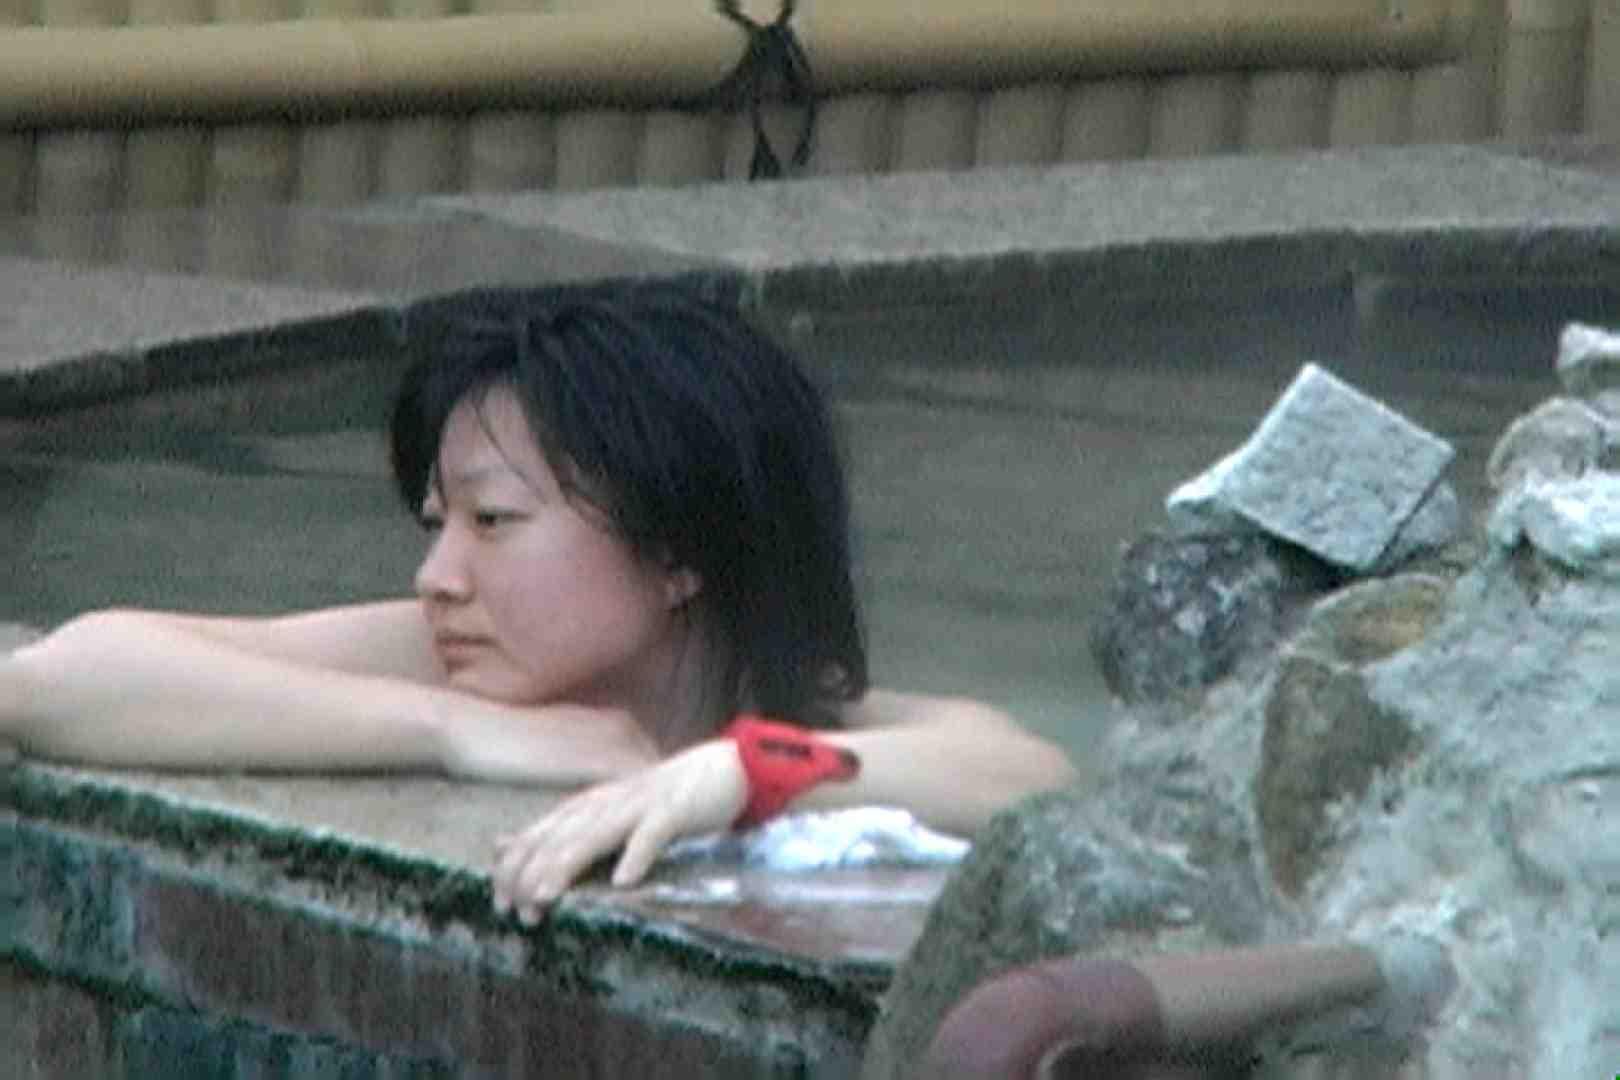 Aquaな露天風呂Vol.649 0  102連発 12